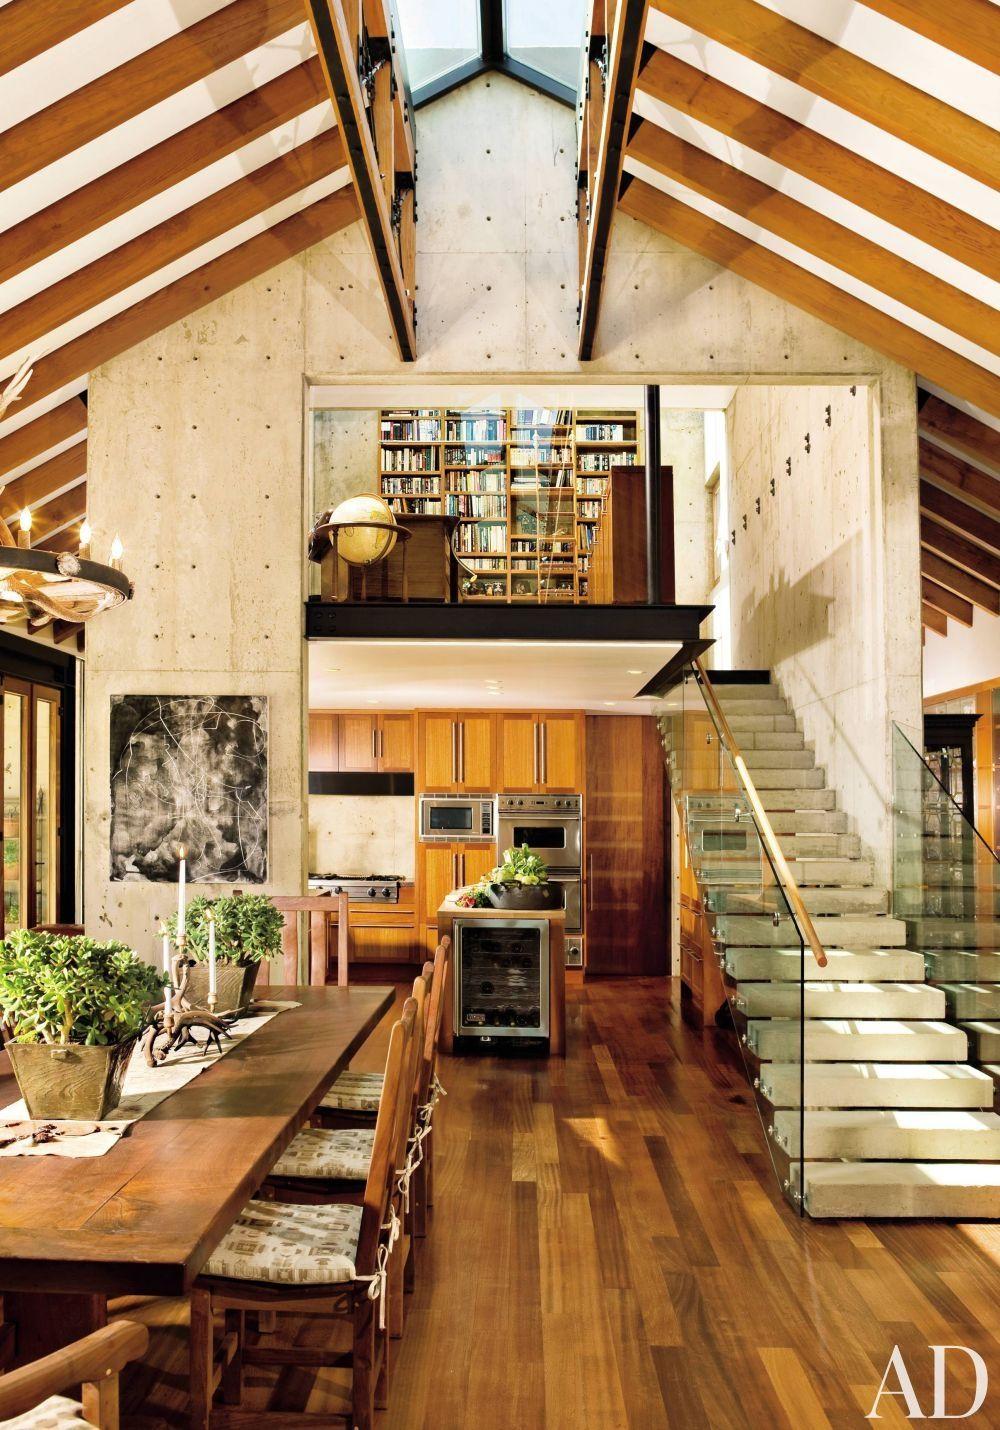 Home Decor Decorating Ideas and House design